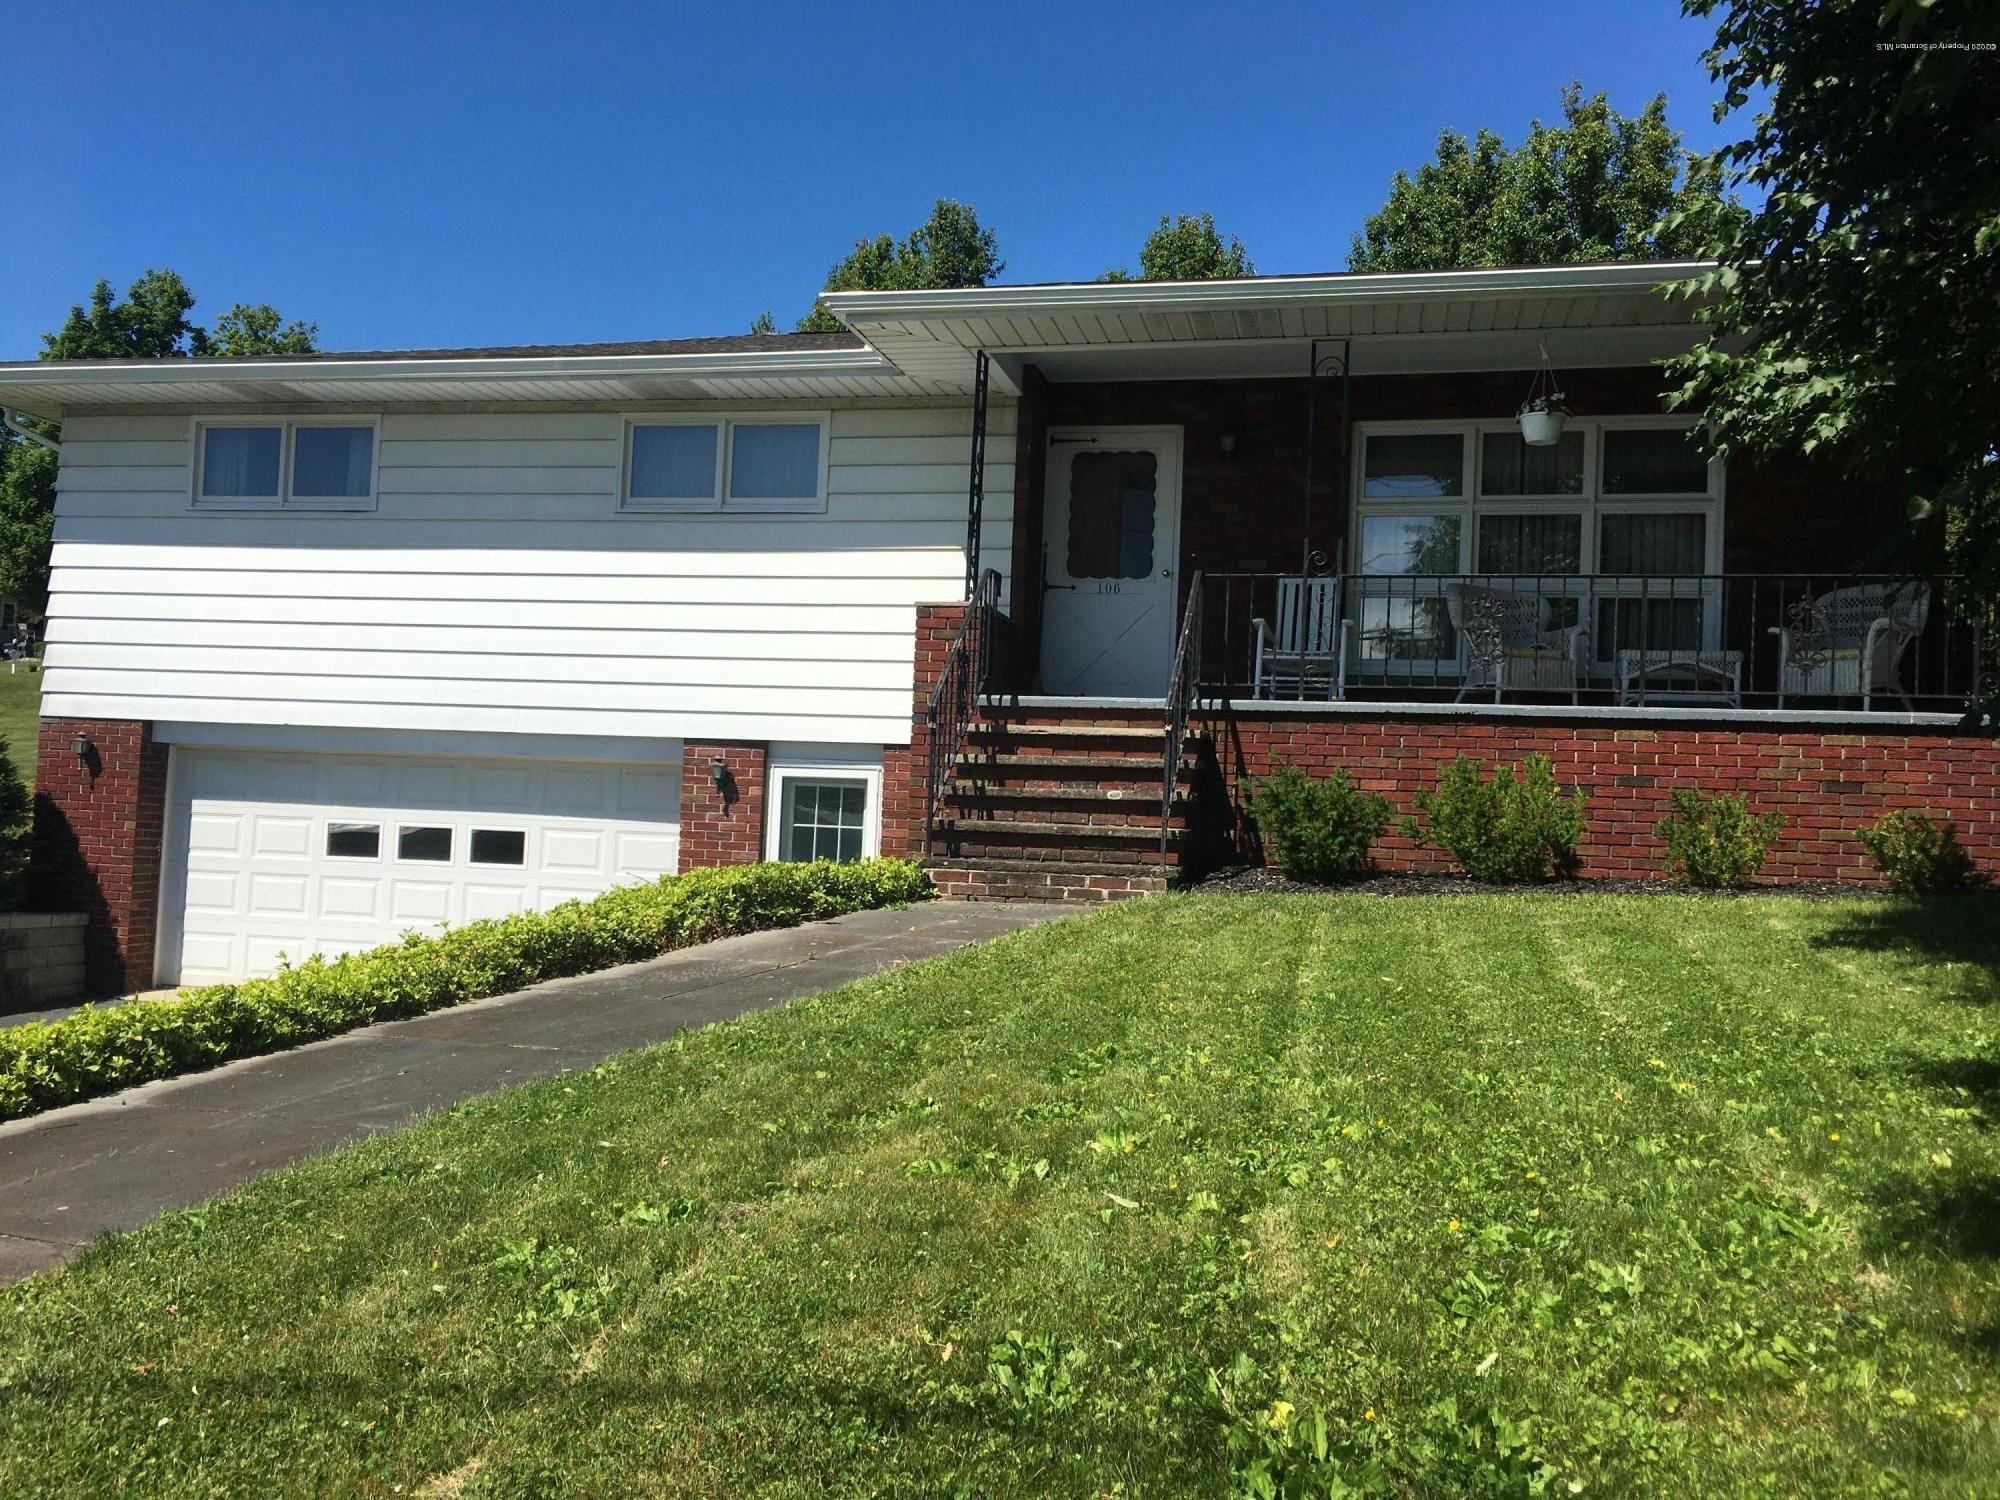 106 Stanton Dr, South Abington Twp, Pennsylvania 18411, 4 Bedrooms Bedrooms, 8 Rooms Rooms,2 BathroomsBathrooms,Single Family,For Sale,Stanton,20-2229